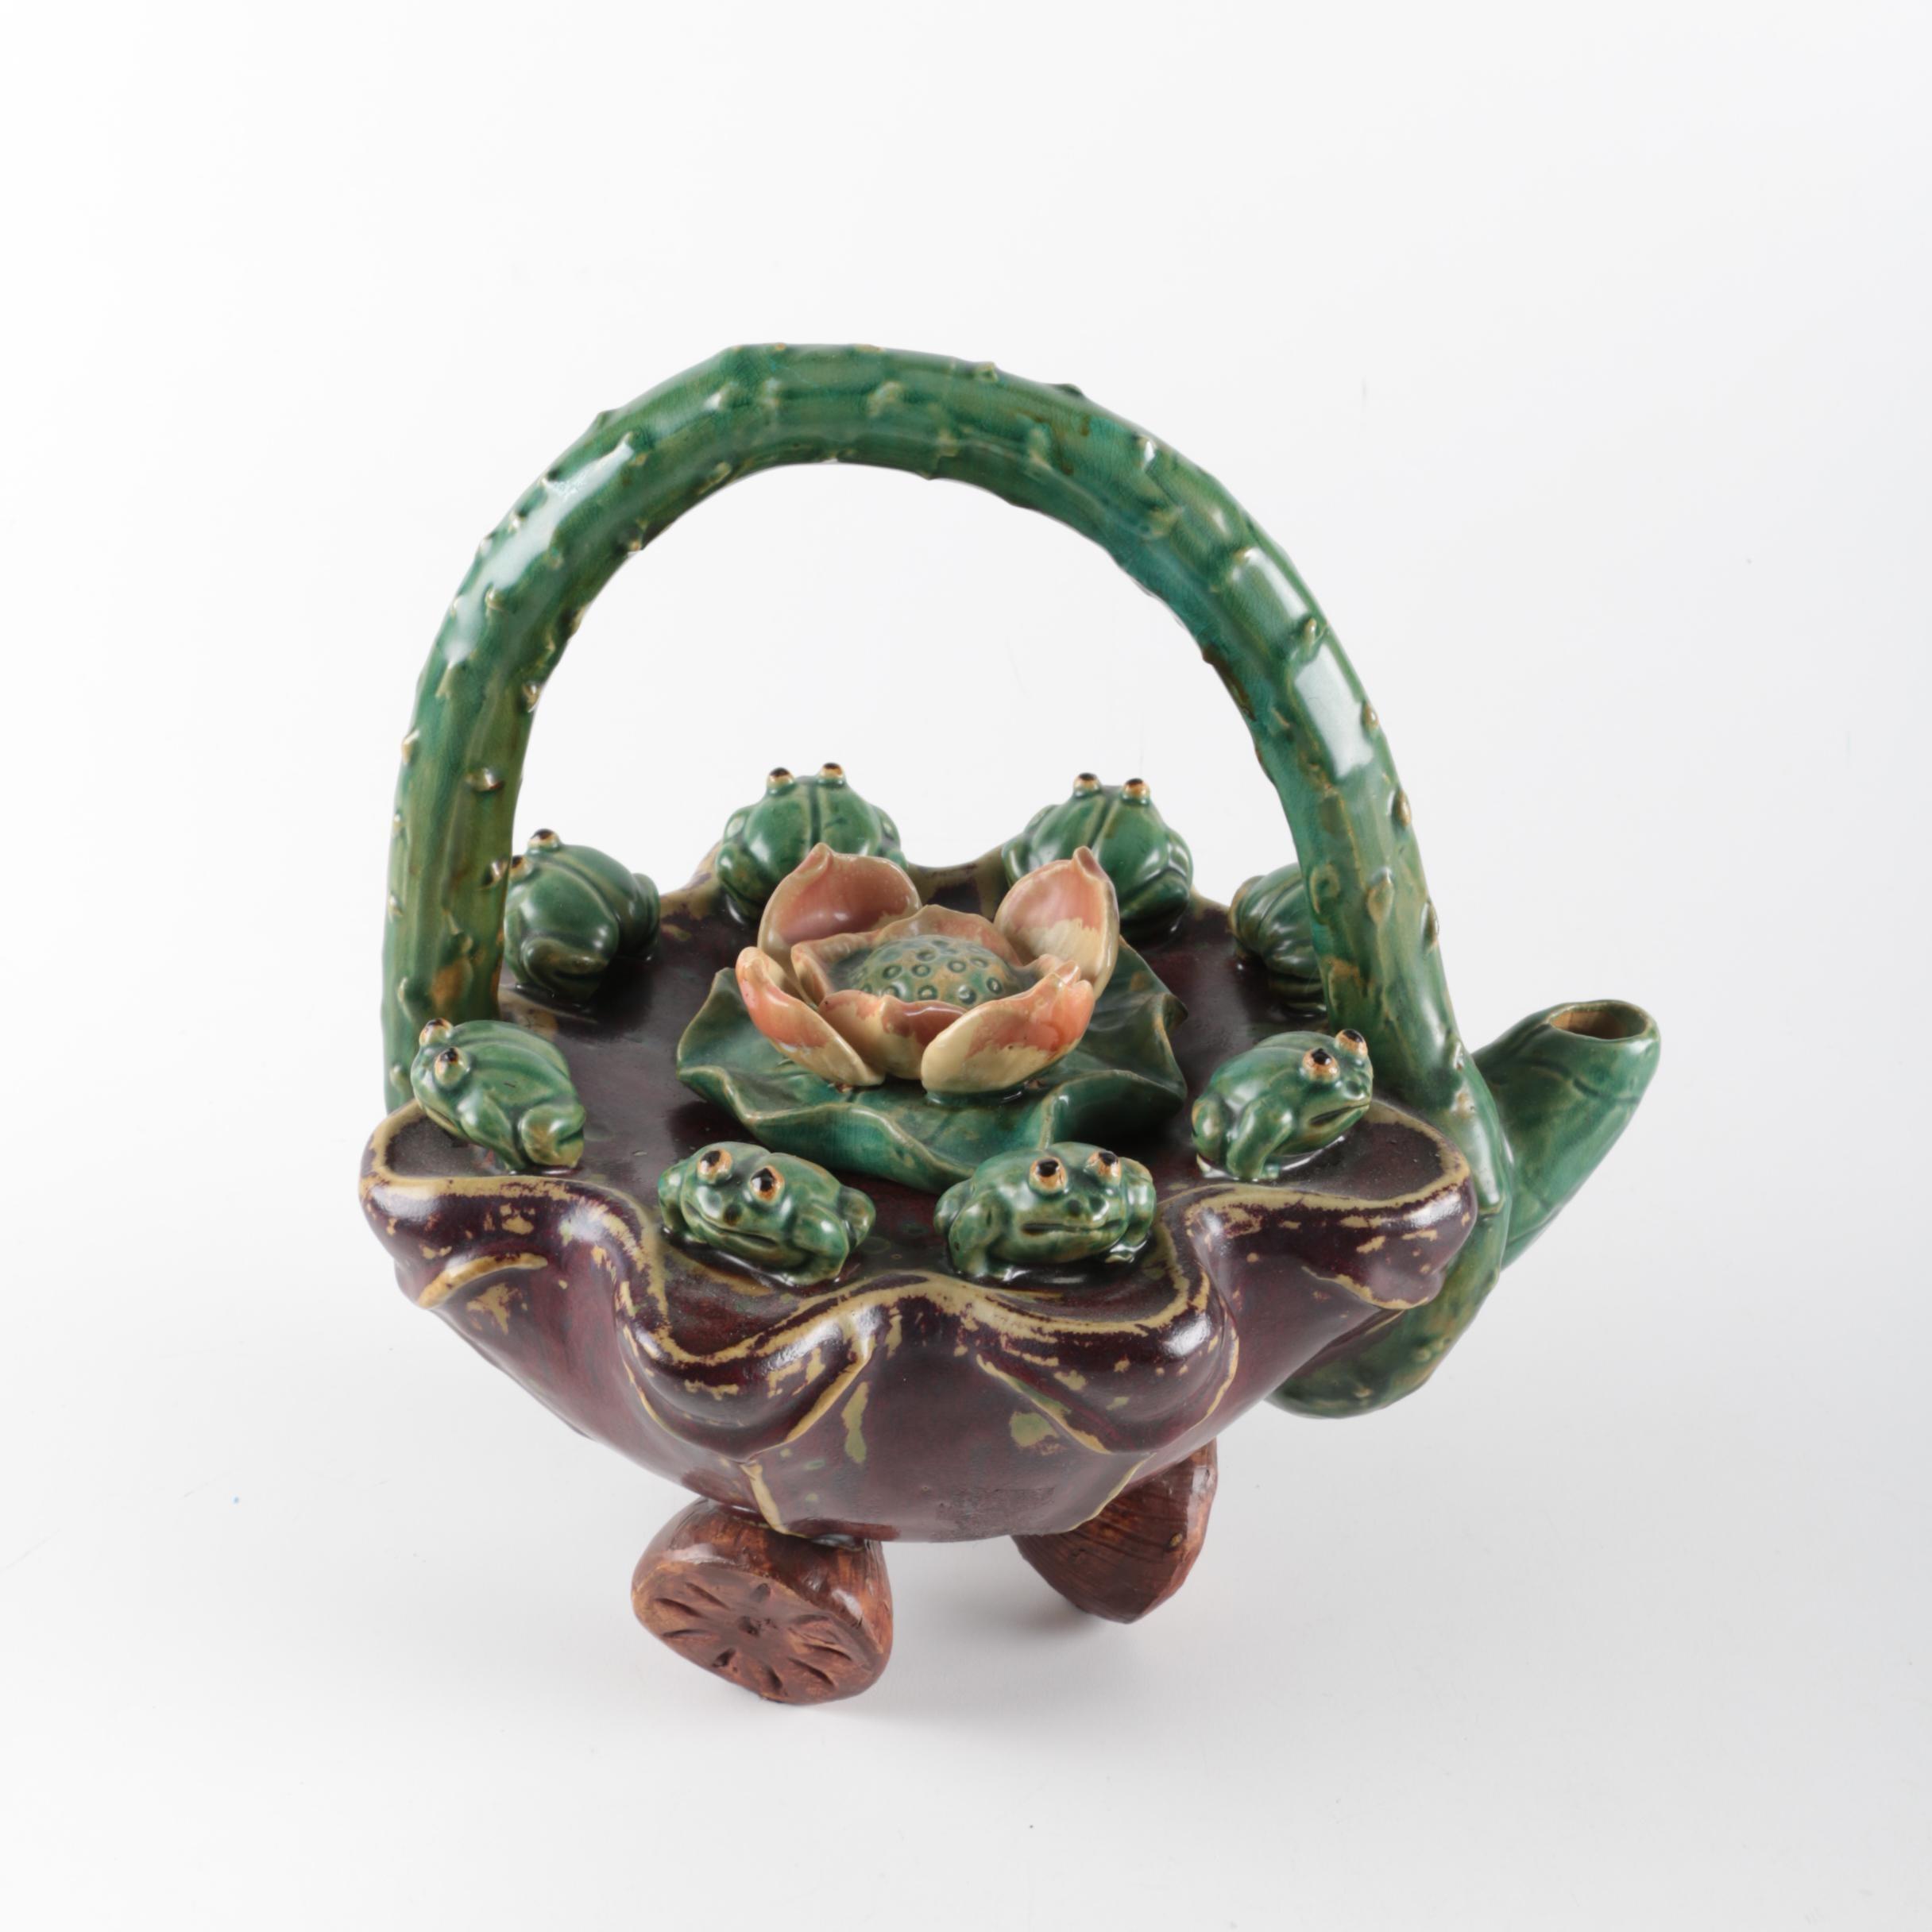 Ceramic Frog Themed Decorative Teapot